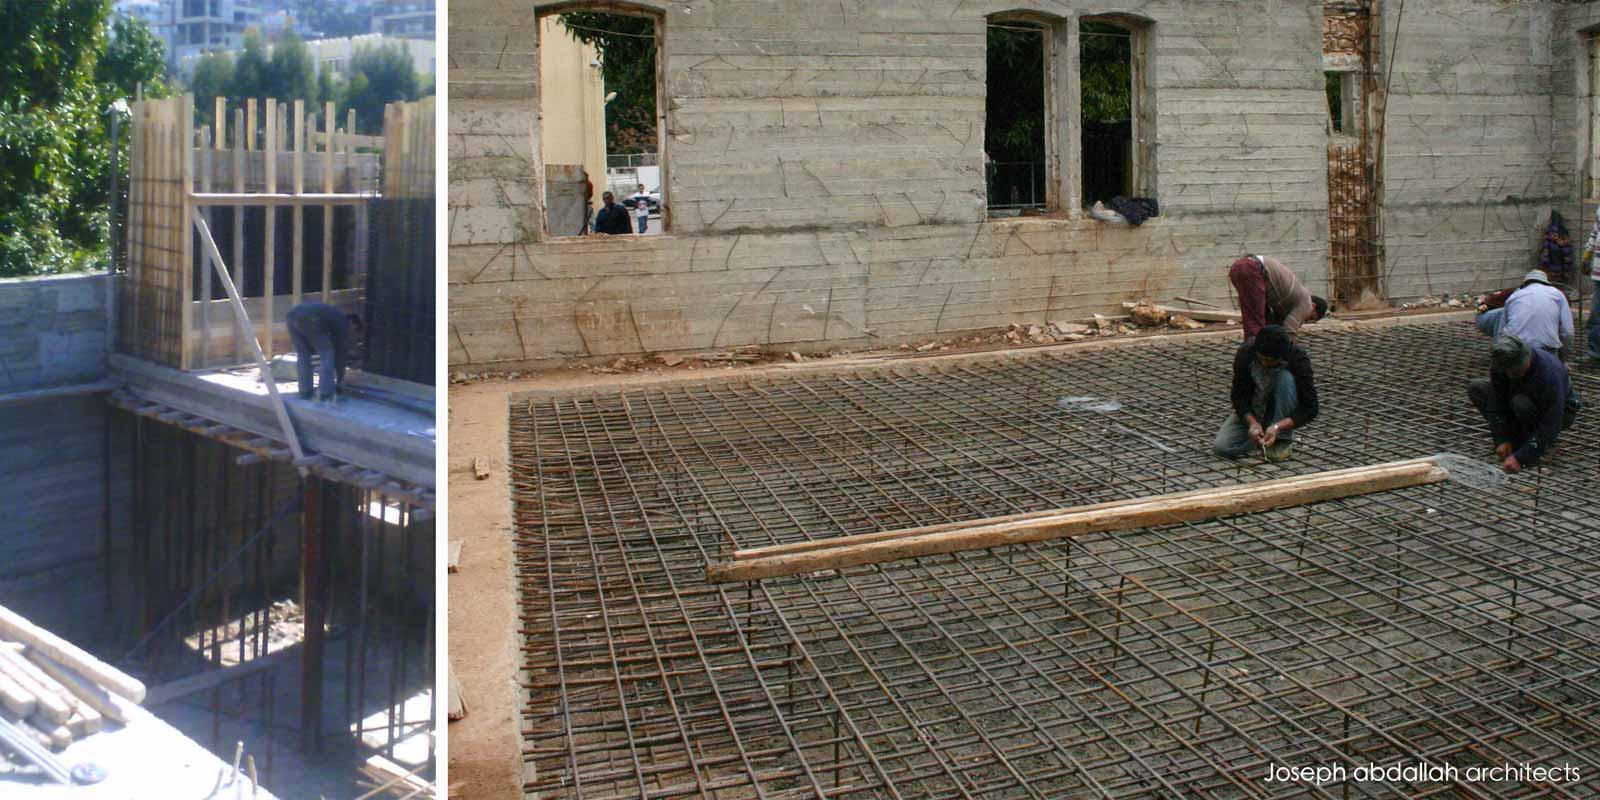 bank-lcb-sgbl-apotres-restoration-architecture-joseph-abdallah-architects-6